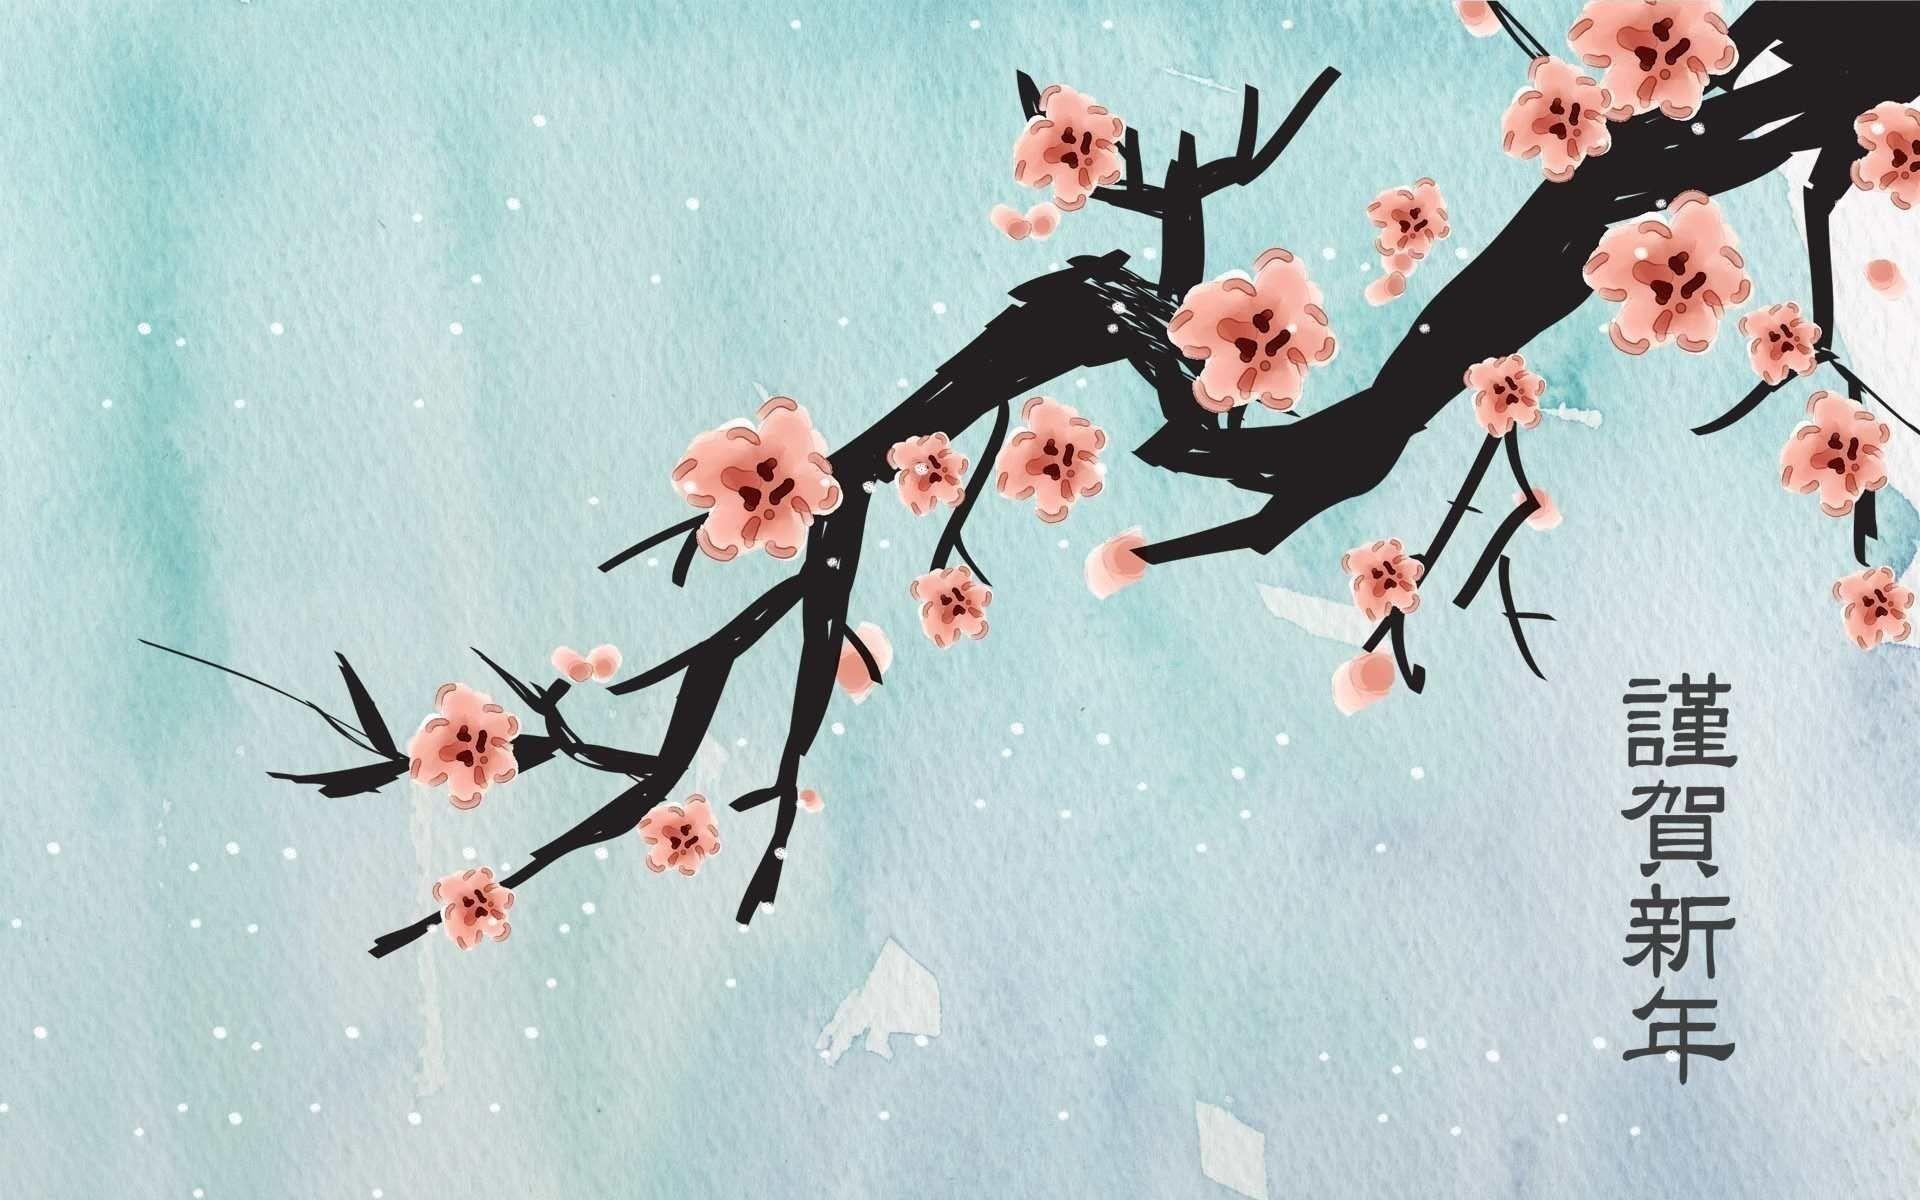 Beautiful Artsy Anime Aesthetic Wallpaper Desktop Photos In 2020 Japanese Artwork Japanese Art Art Wallpaper